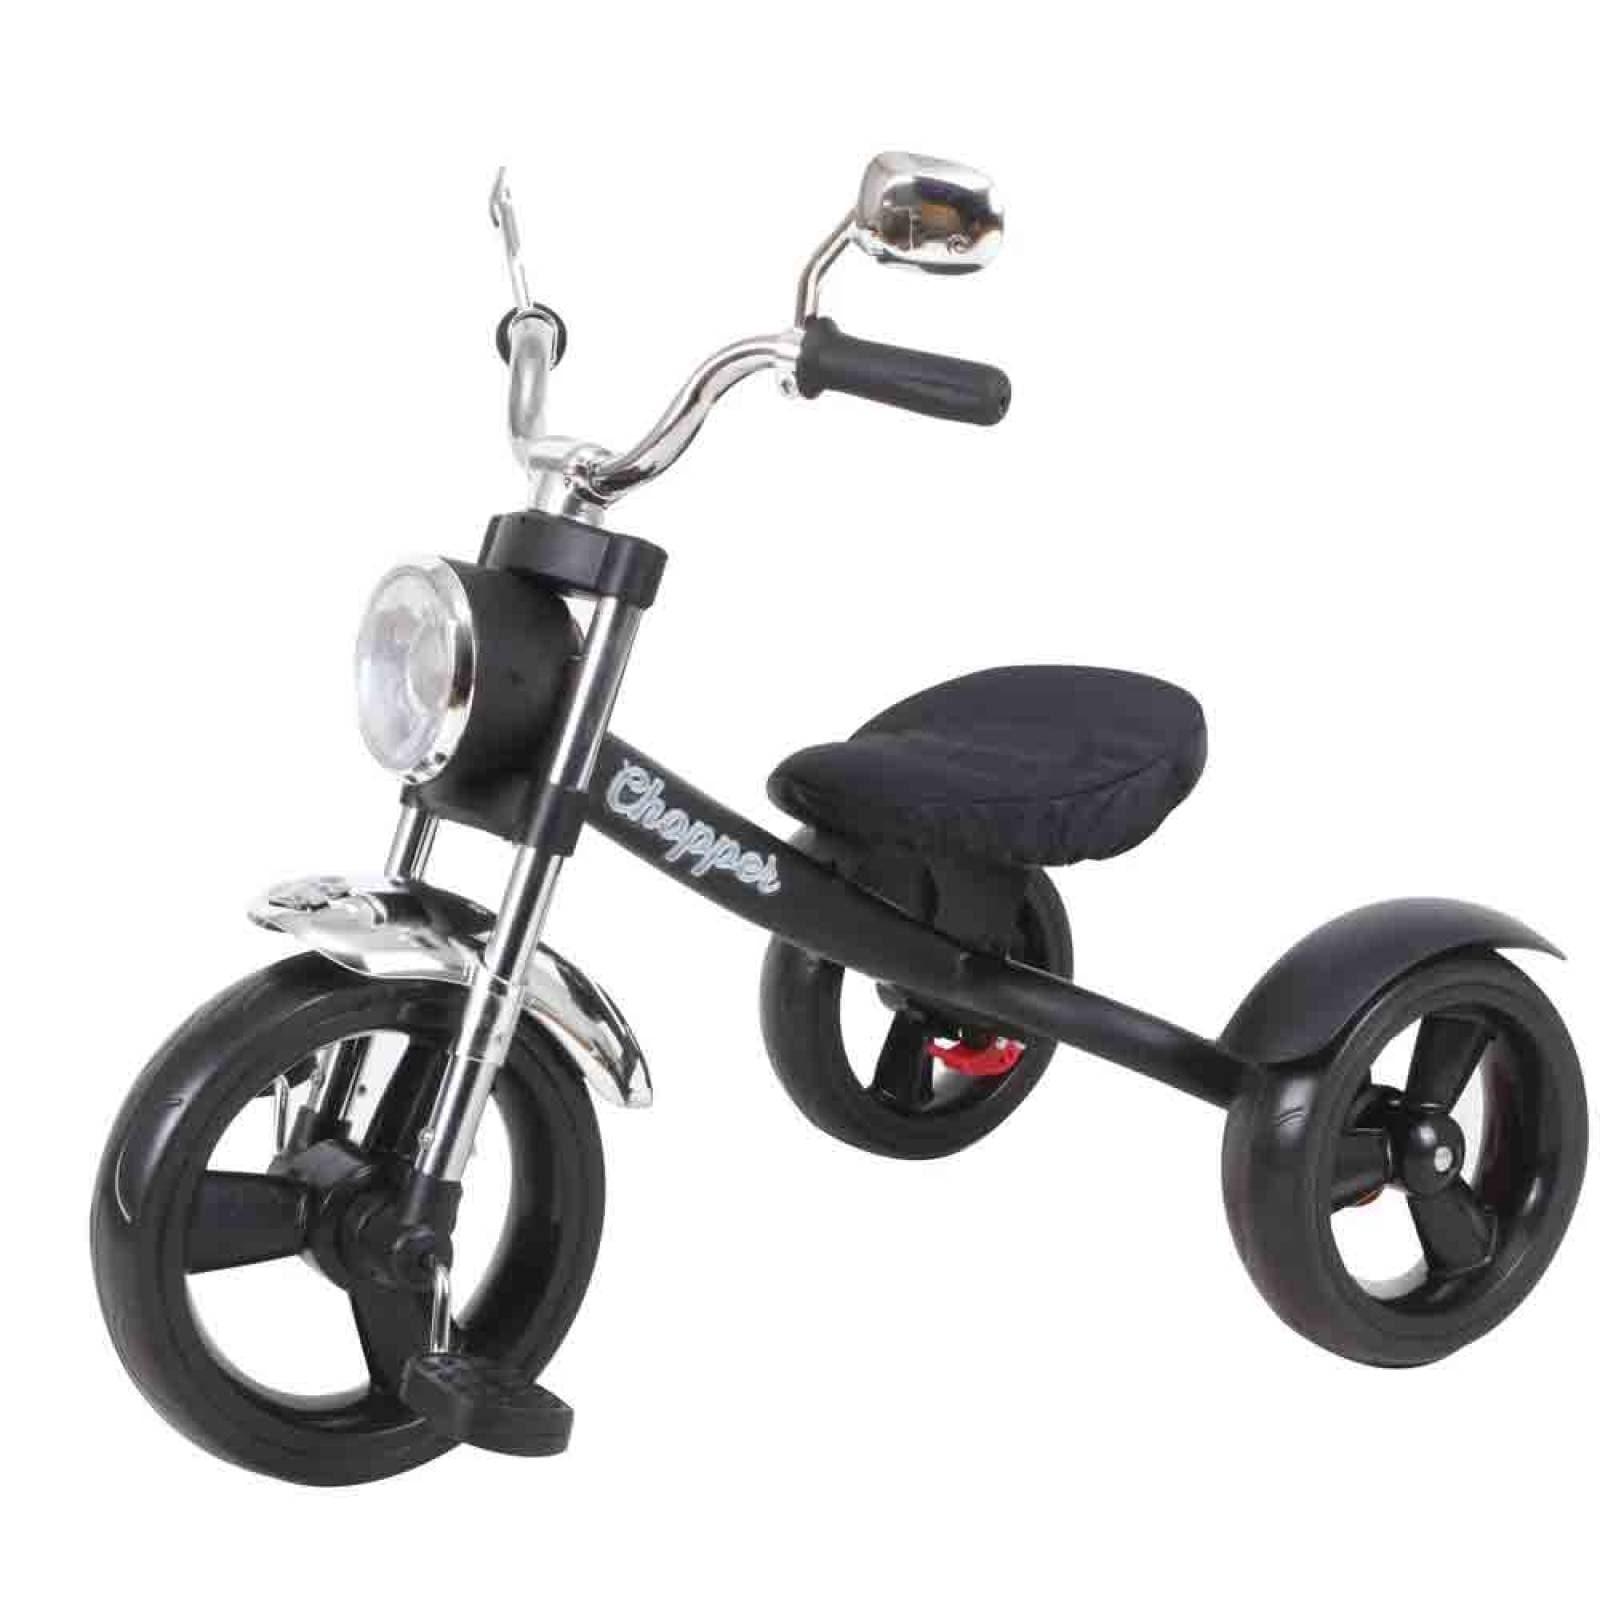 Triciclo Rebeld? Basic Niño 2 A 5 Años Metal? Negro Prinsel